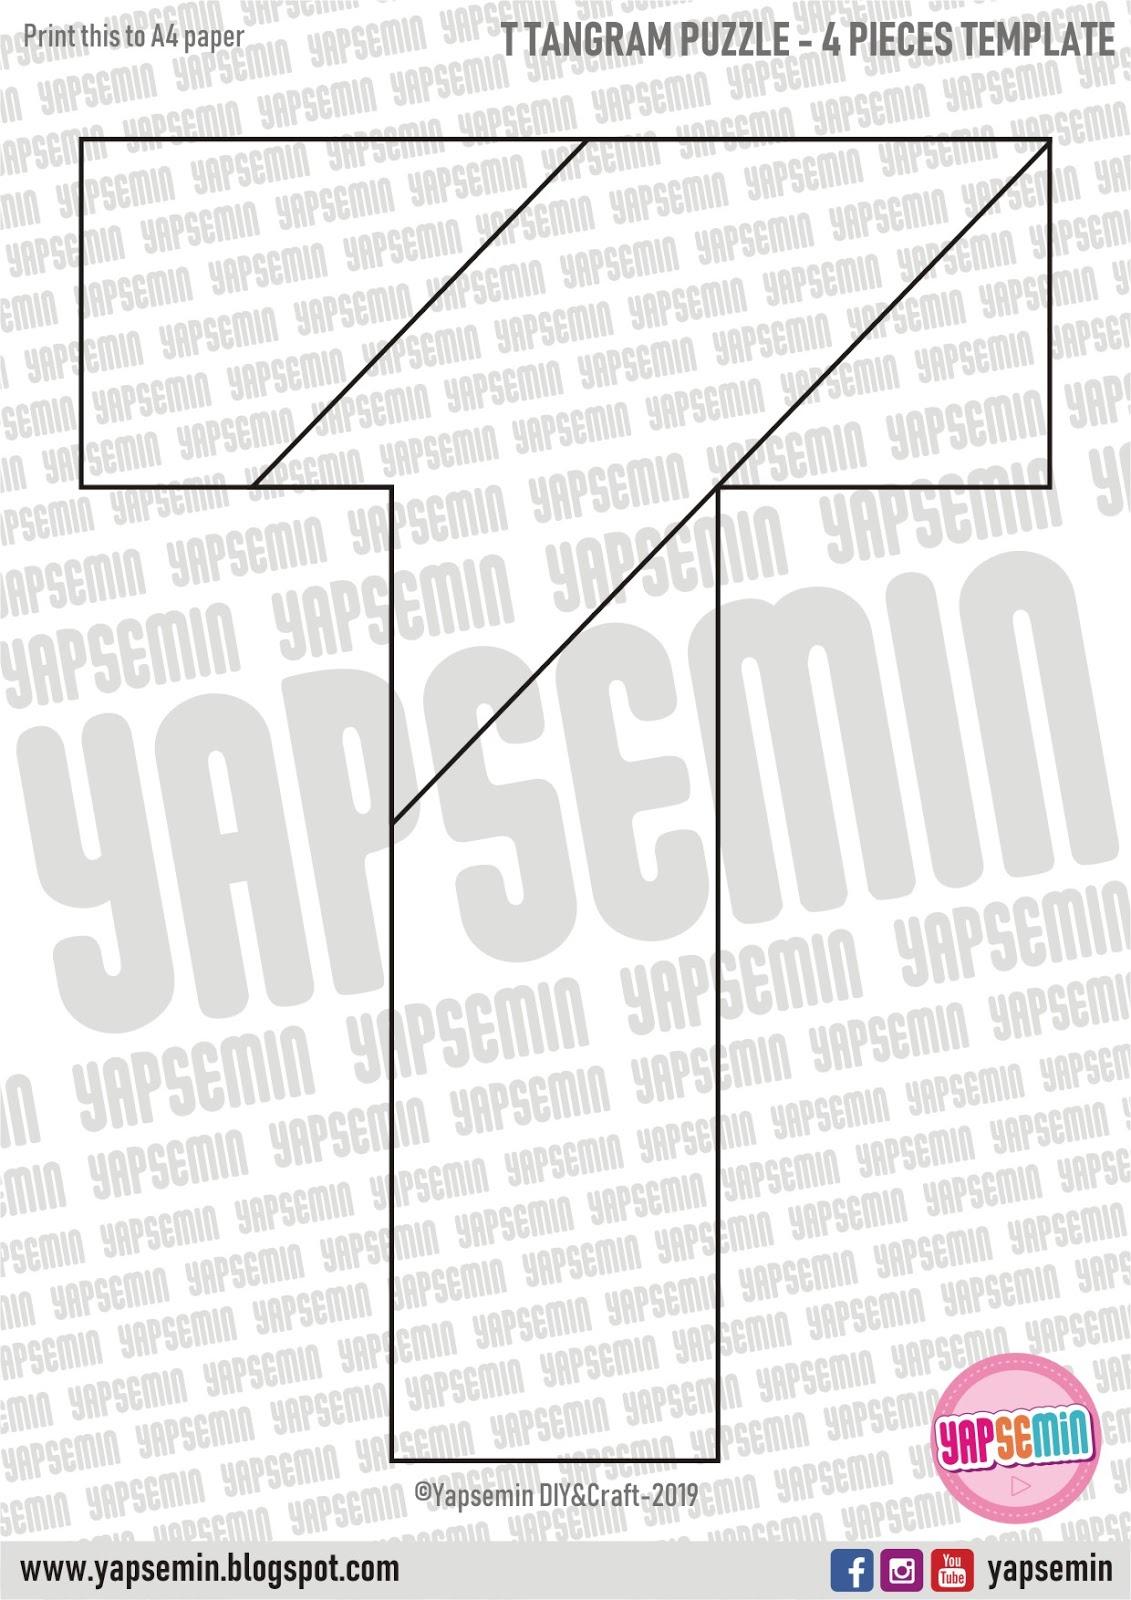 Yapsemin | Diy | Craft - Templates: T Tangram Puzzle dedans Pièces Tangram